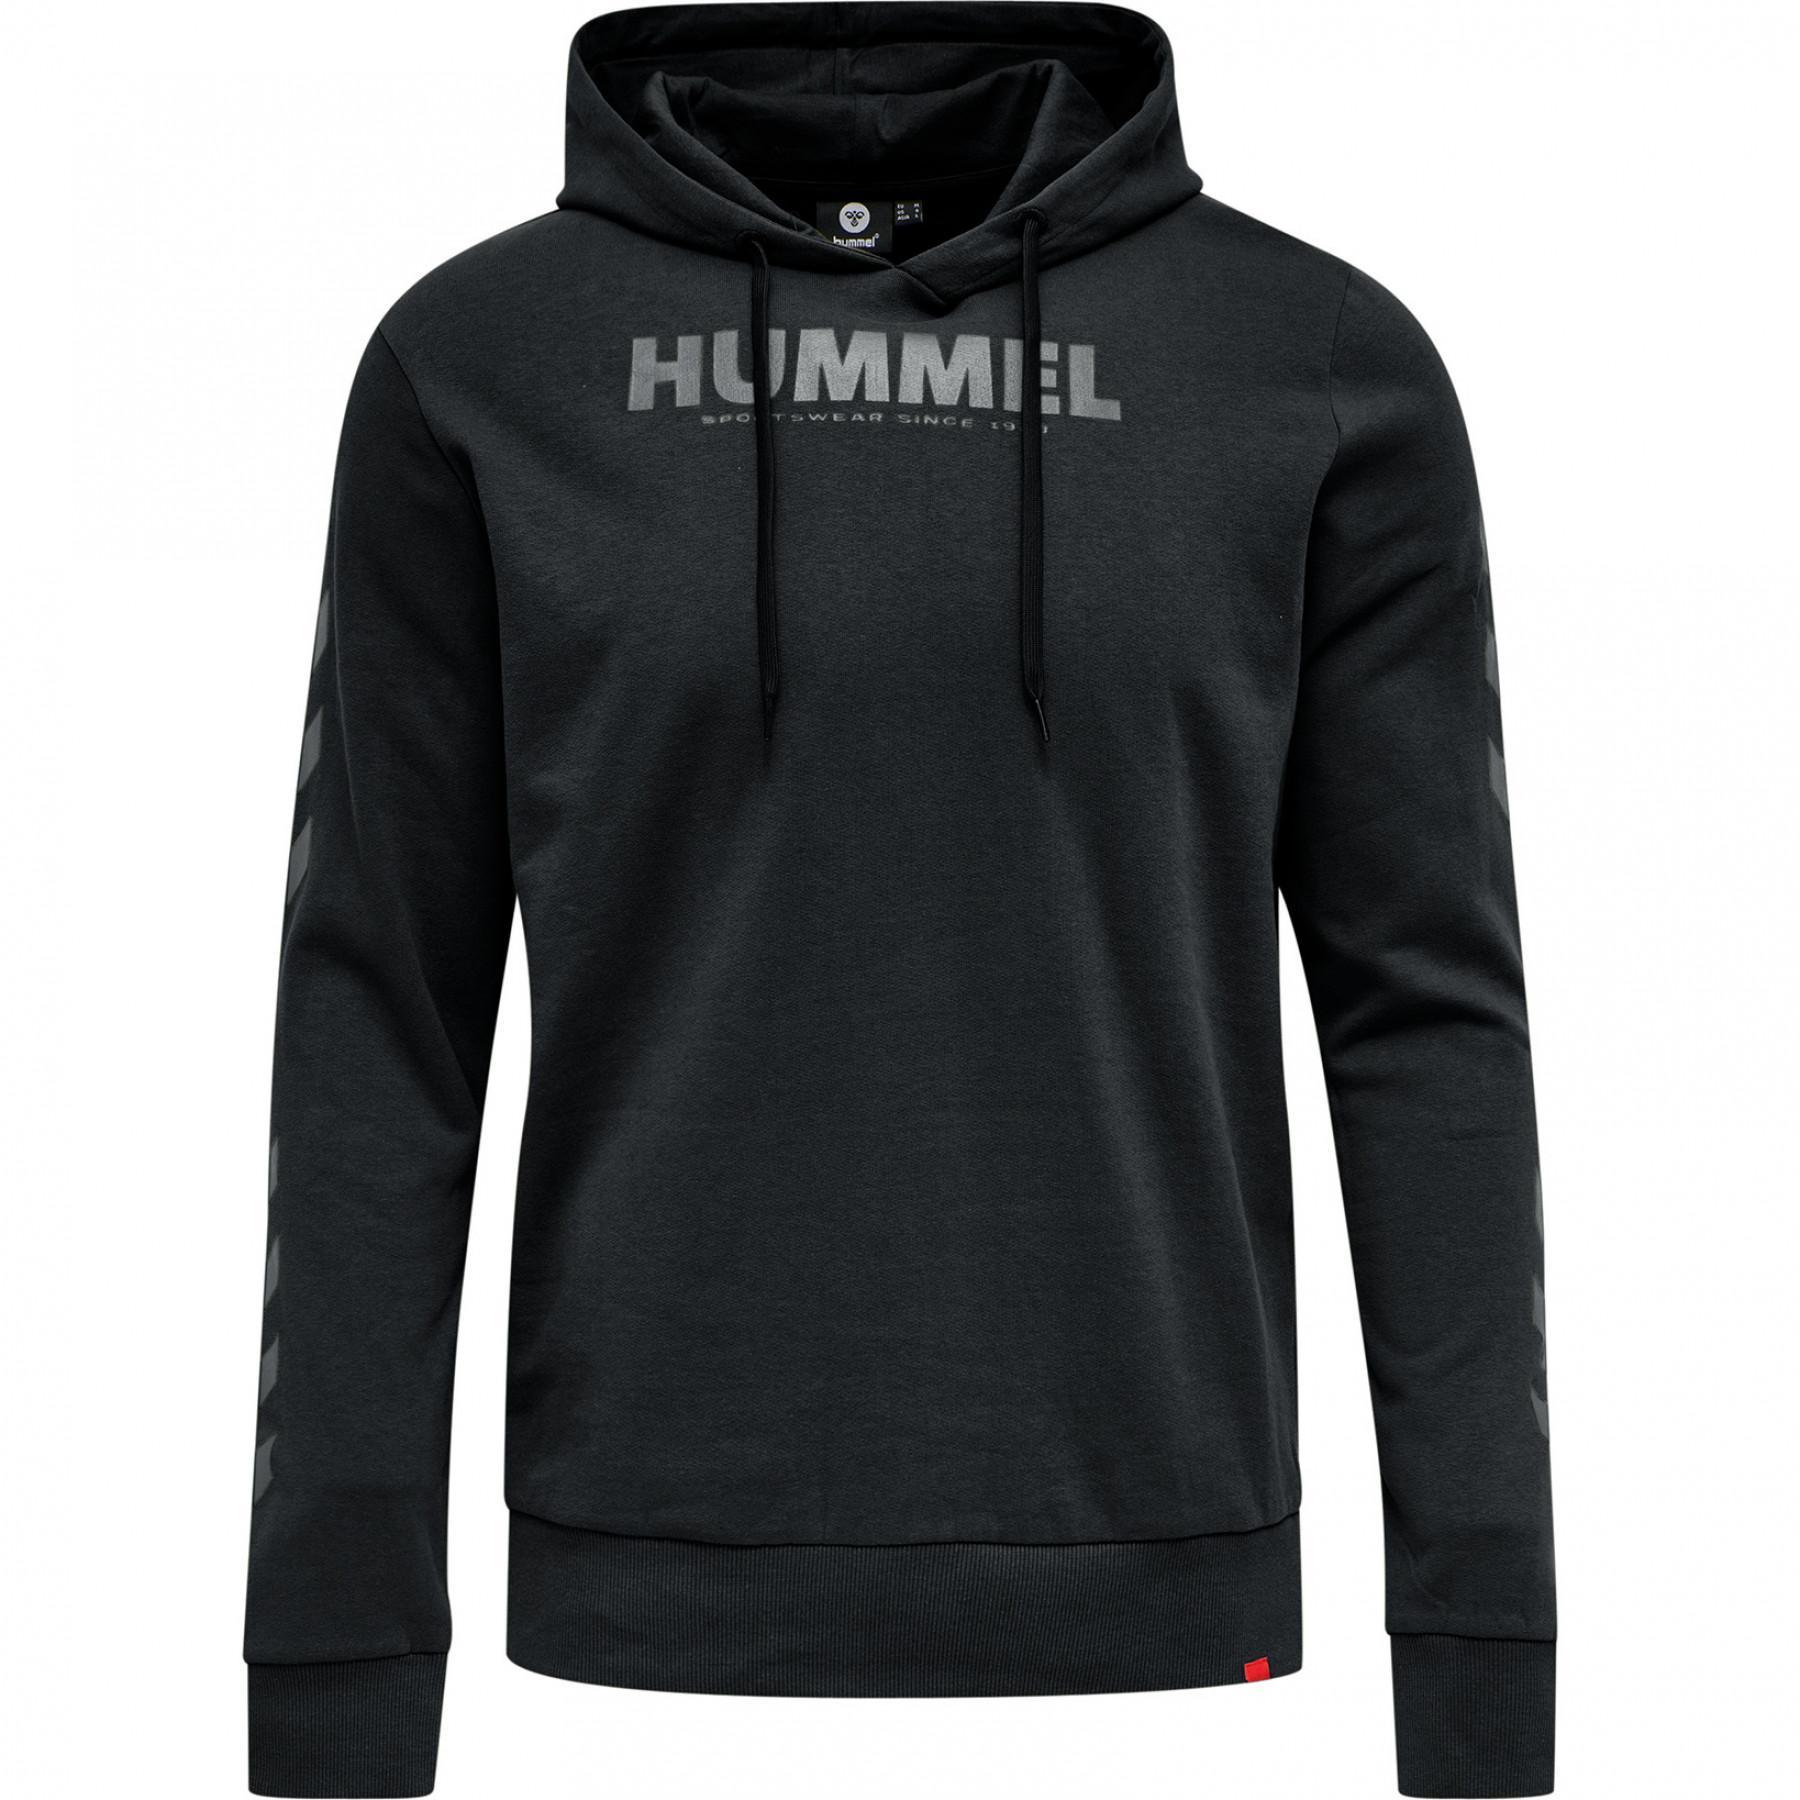 Hummel Legacy Hoody